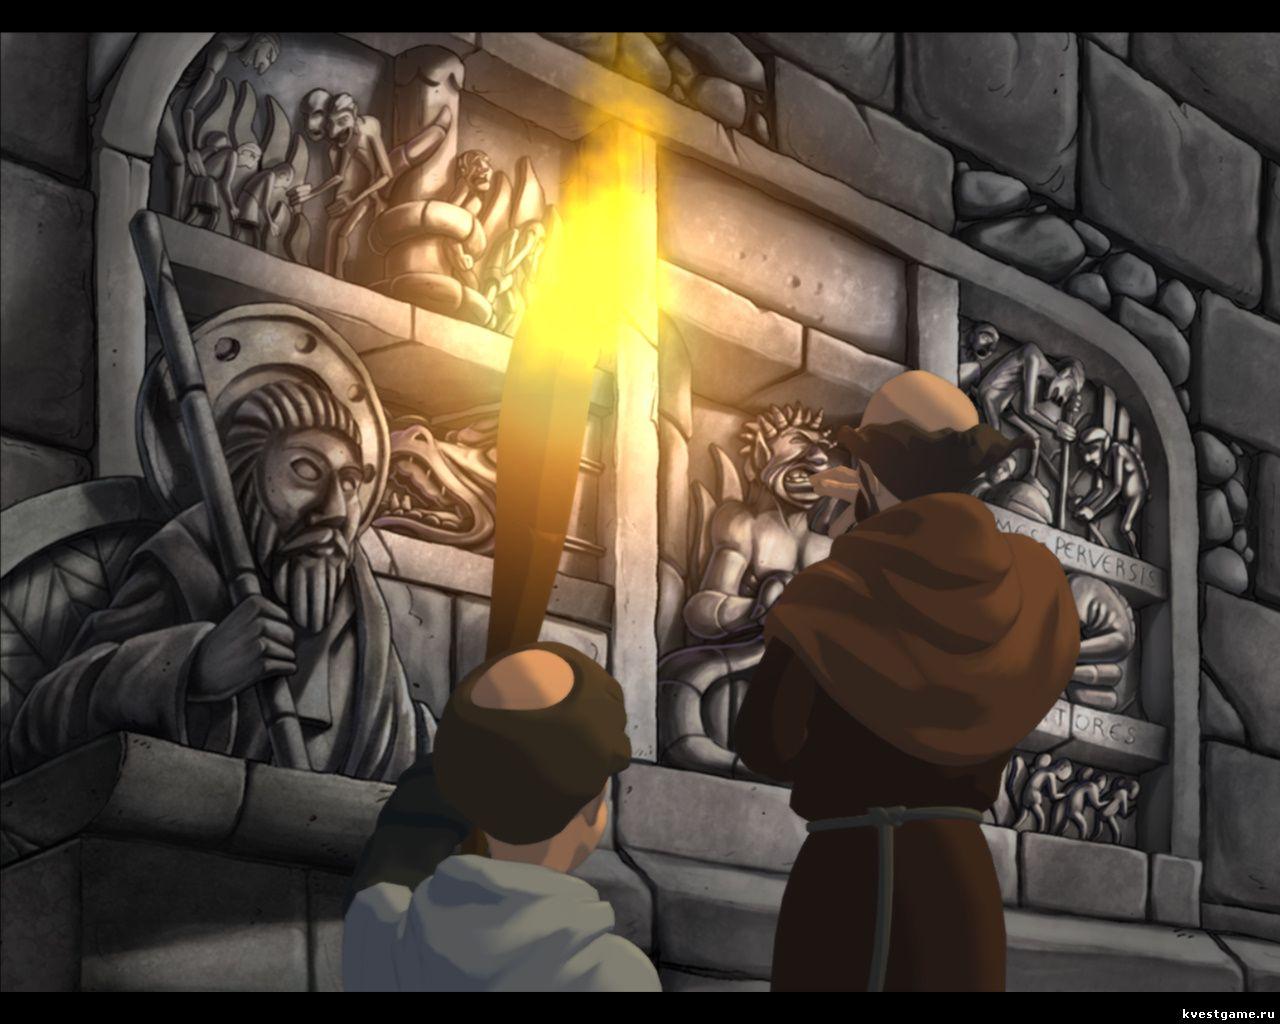 Murder in the Abbey - Леонардо ищет в склепе потайную дверь (глава 3)